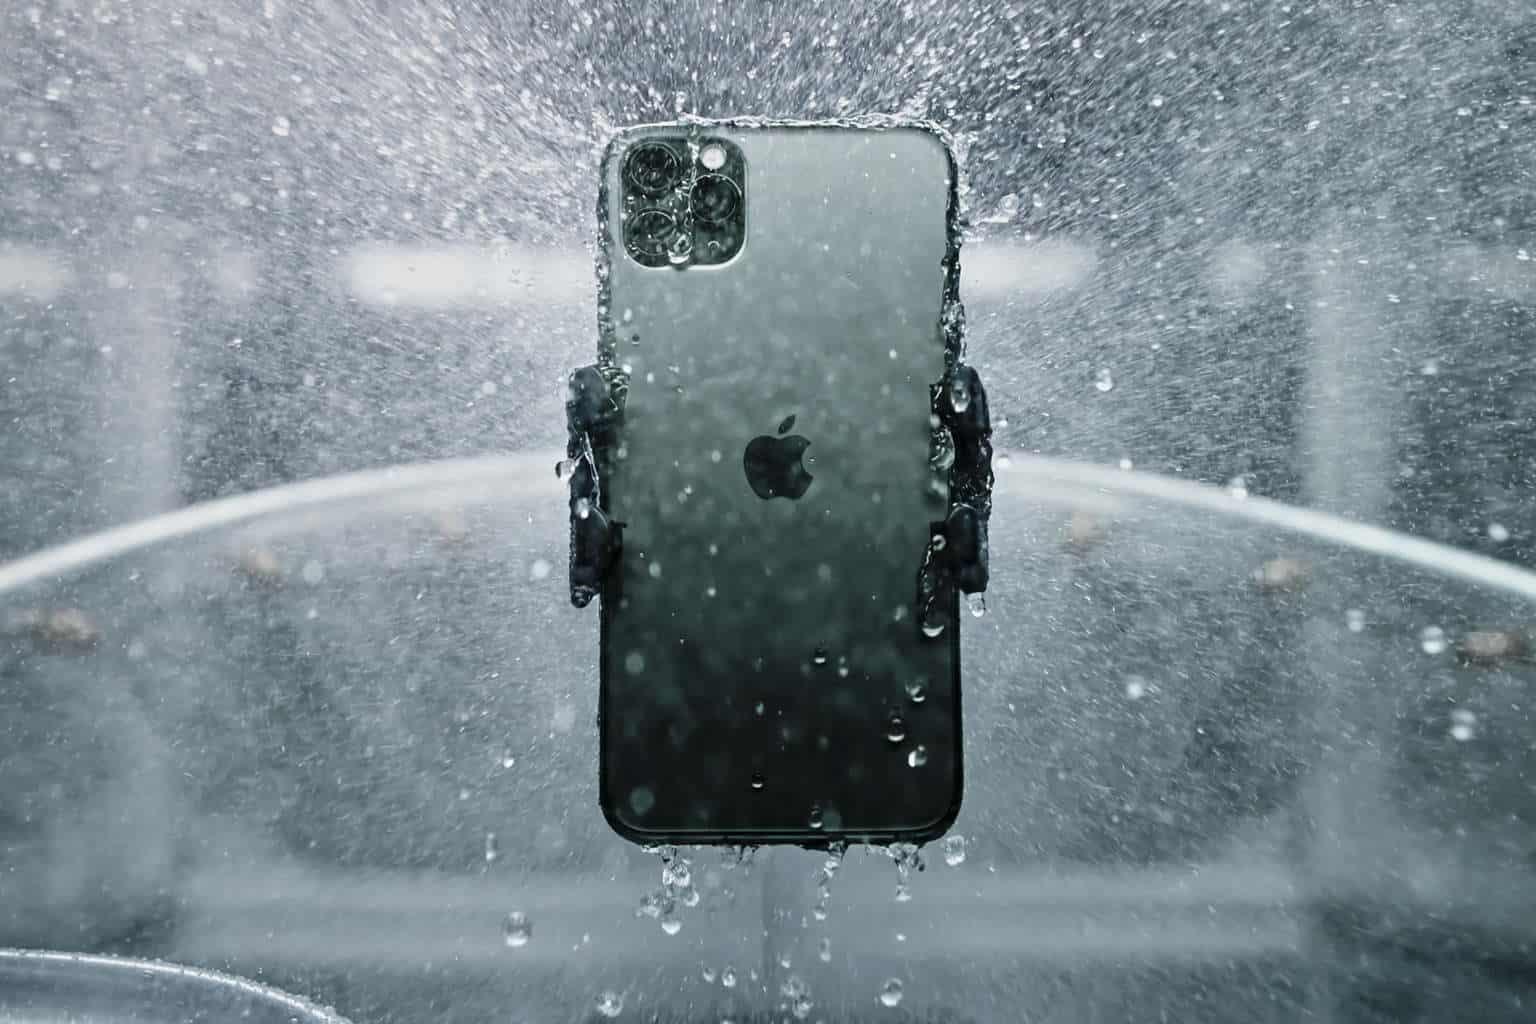 iPhone 11 Pro Max waterproof